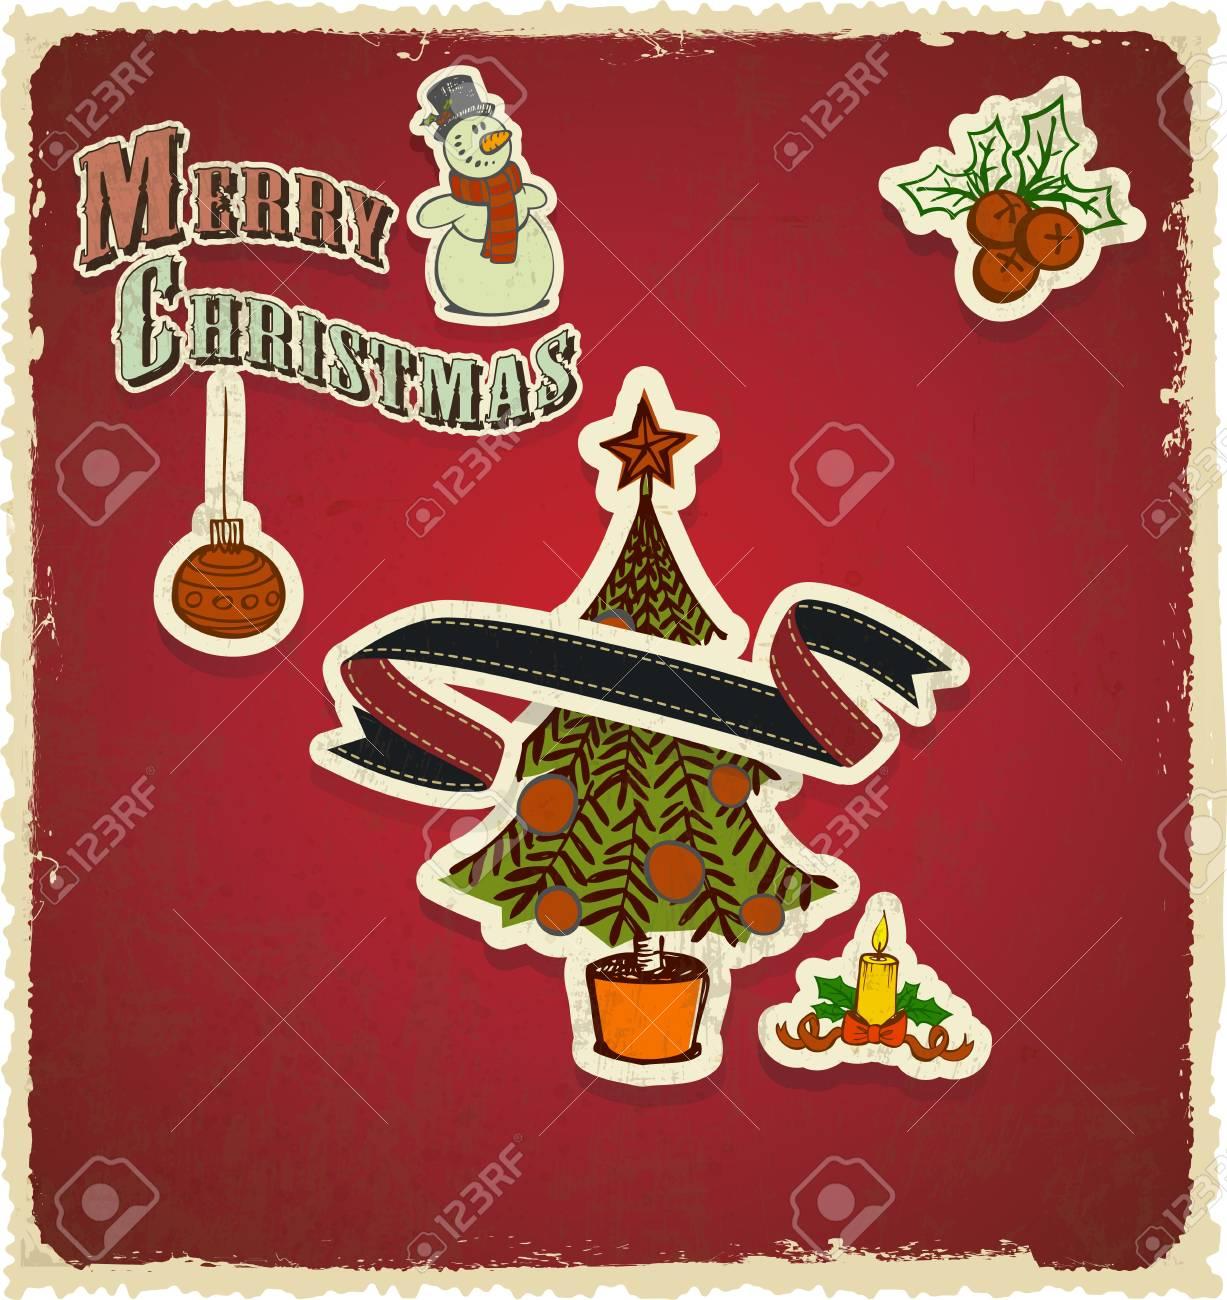 retro vintage christmas tree seasons greetings Stock Vector - 14303382